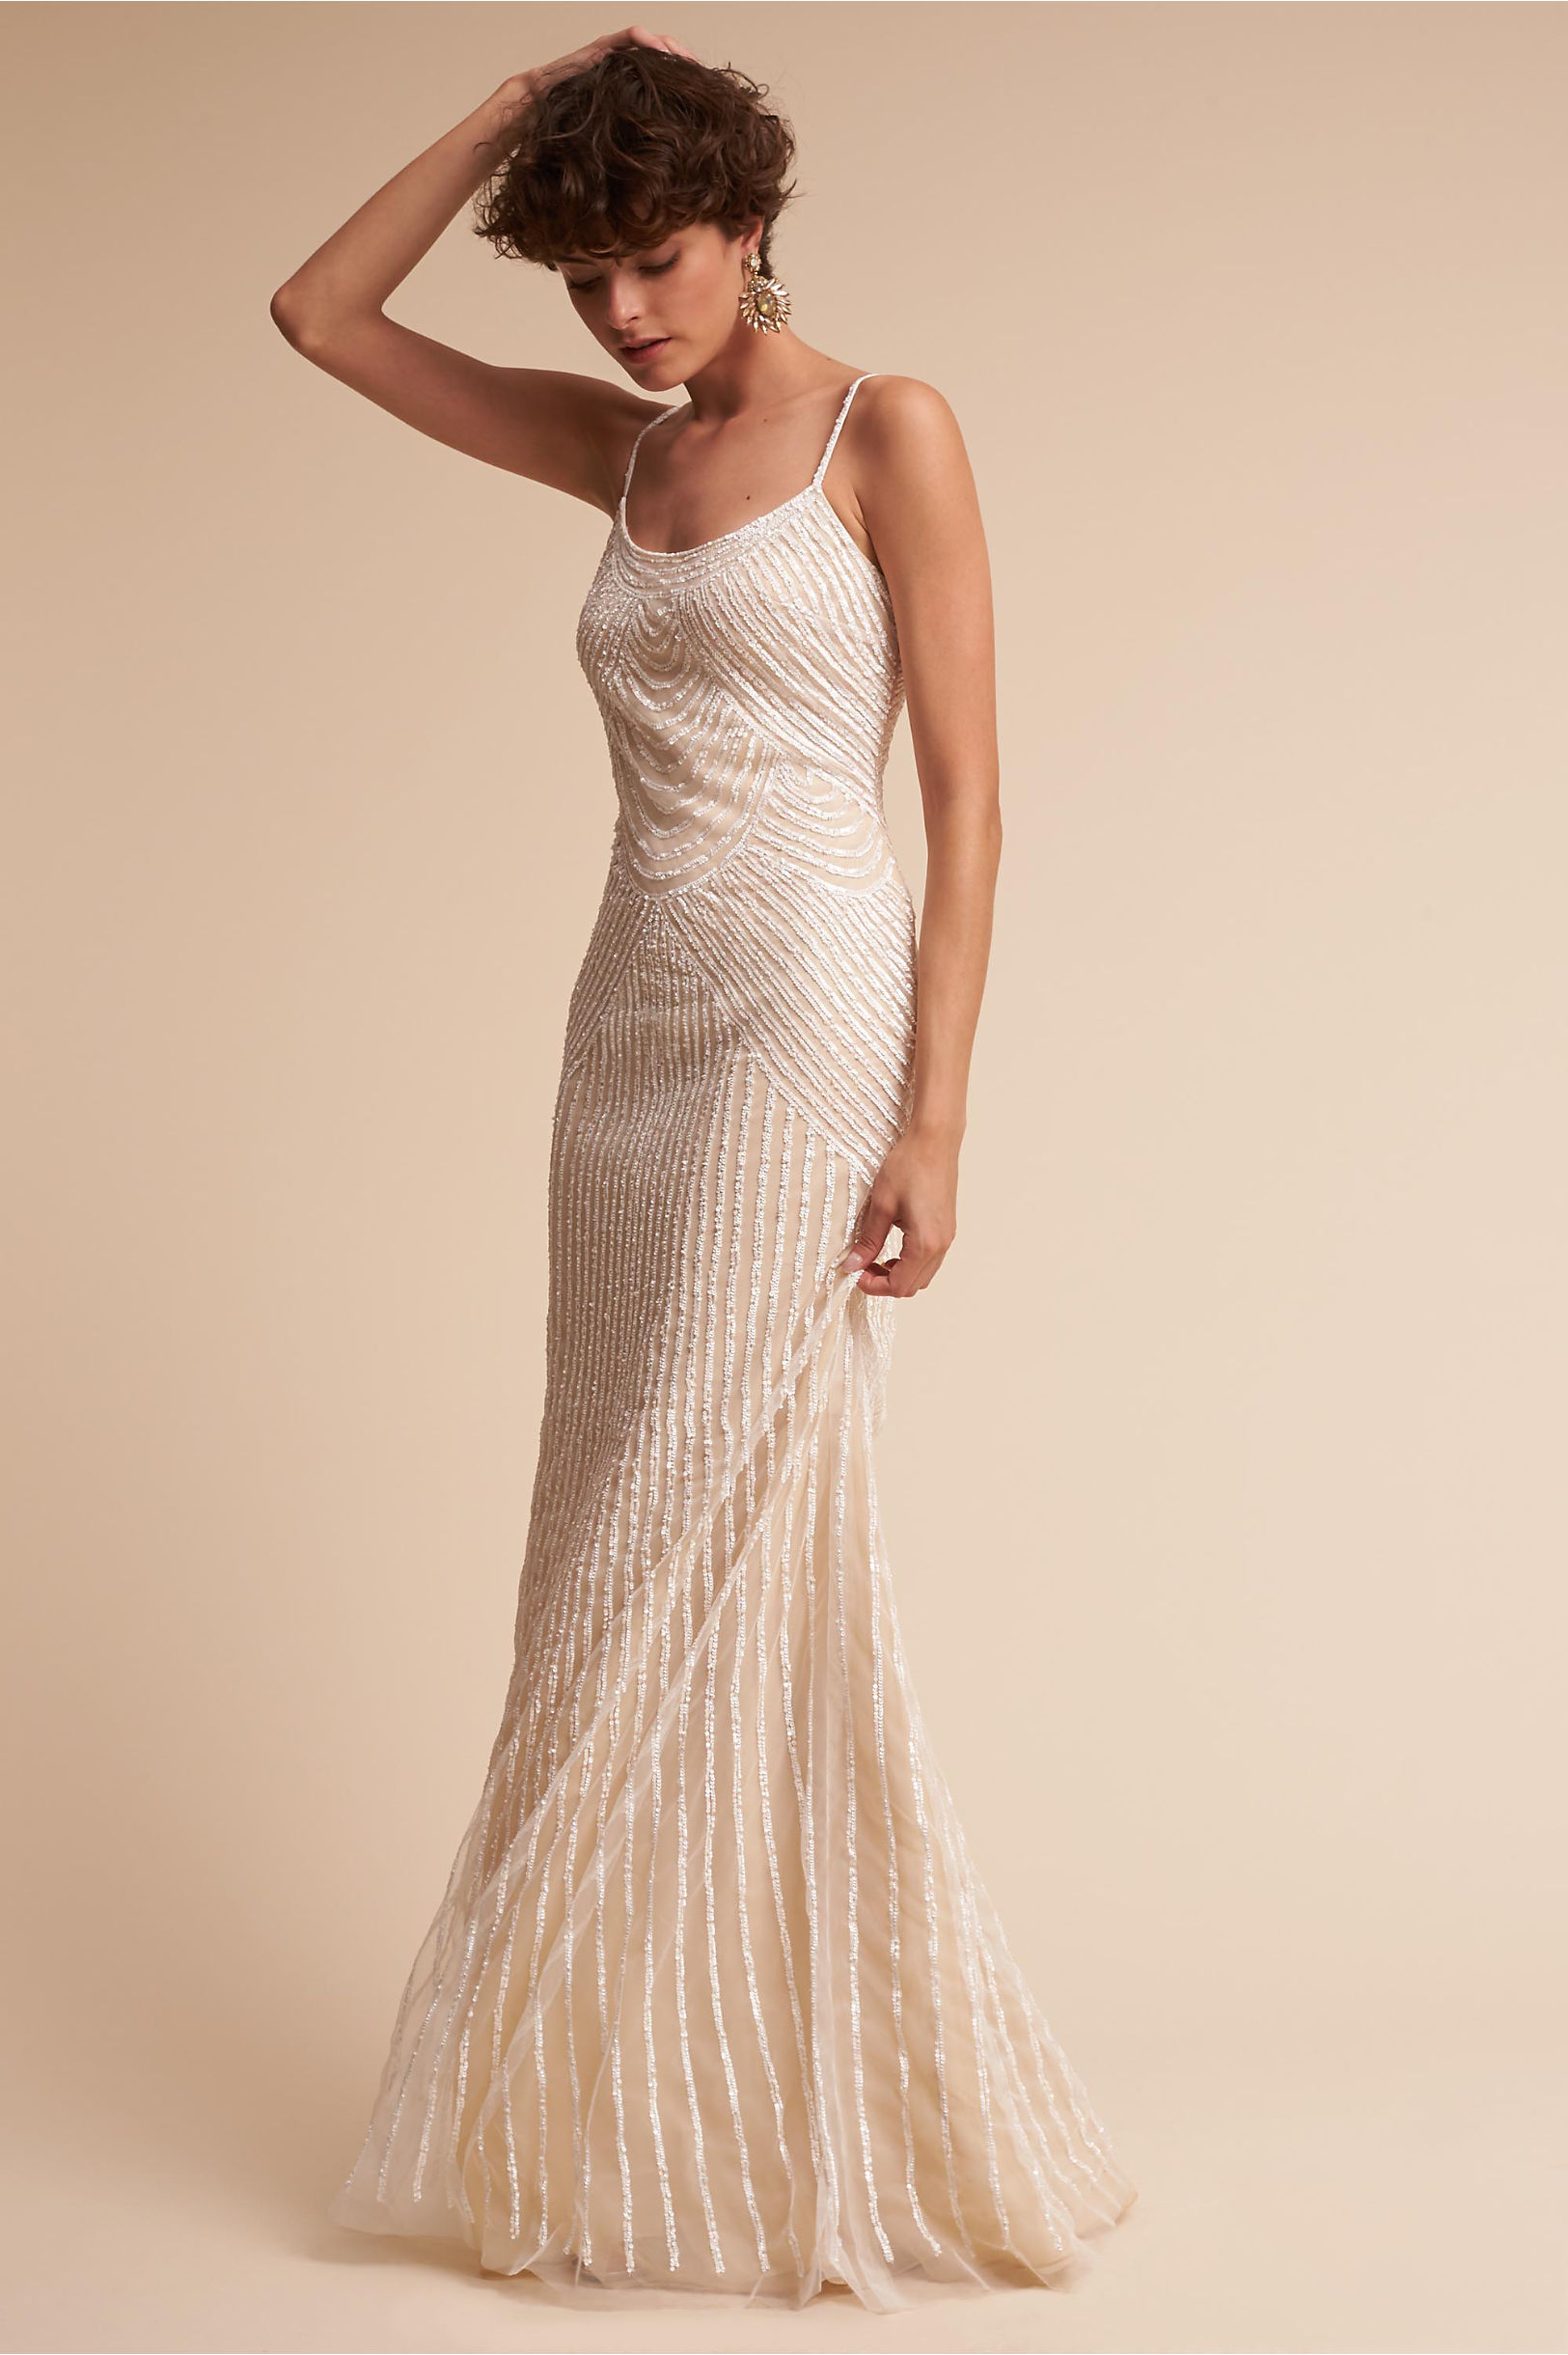 Stasia Gown Cream in Sale | BHLDN